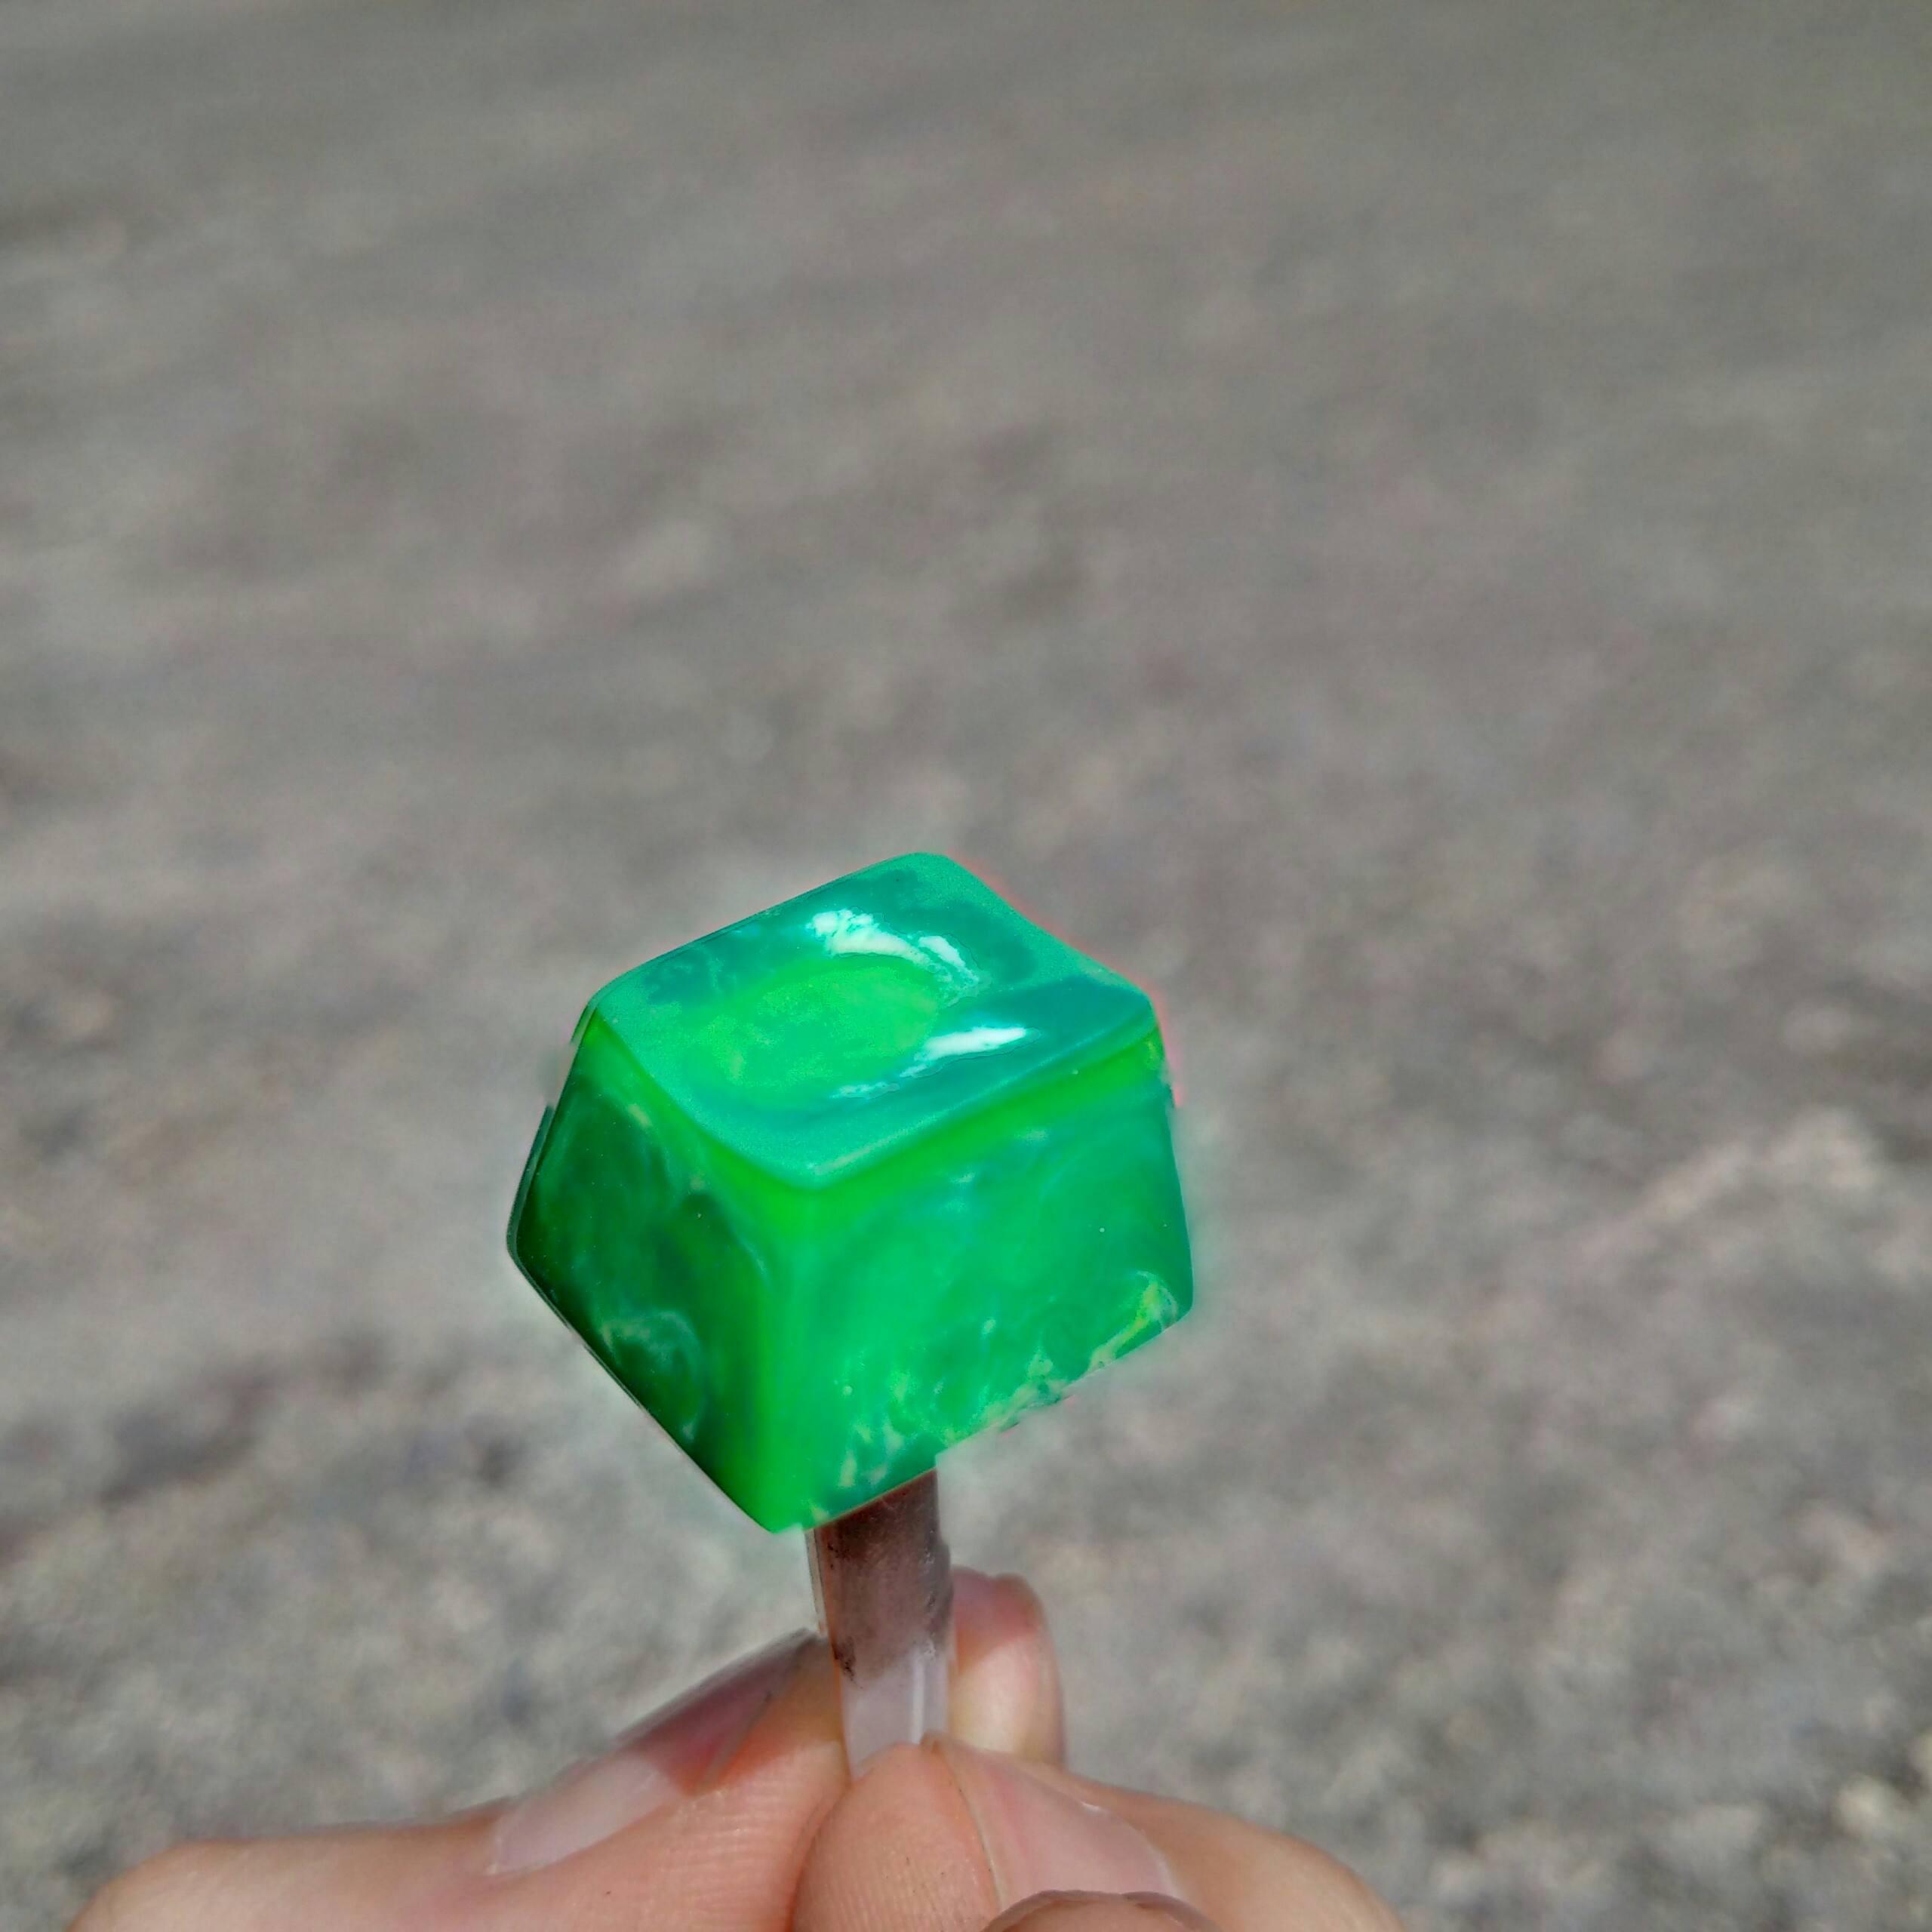 marble-mx-1-green-1